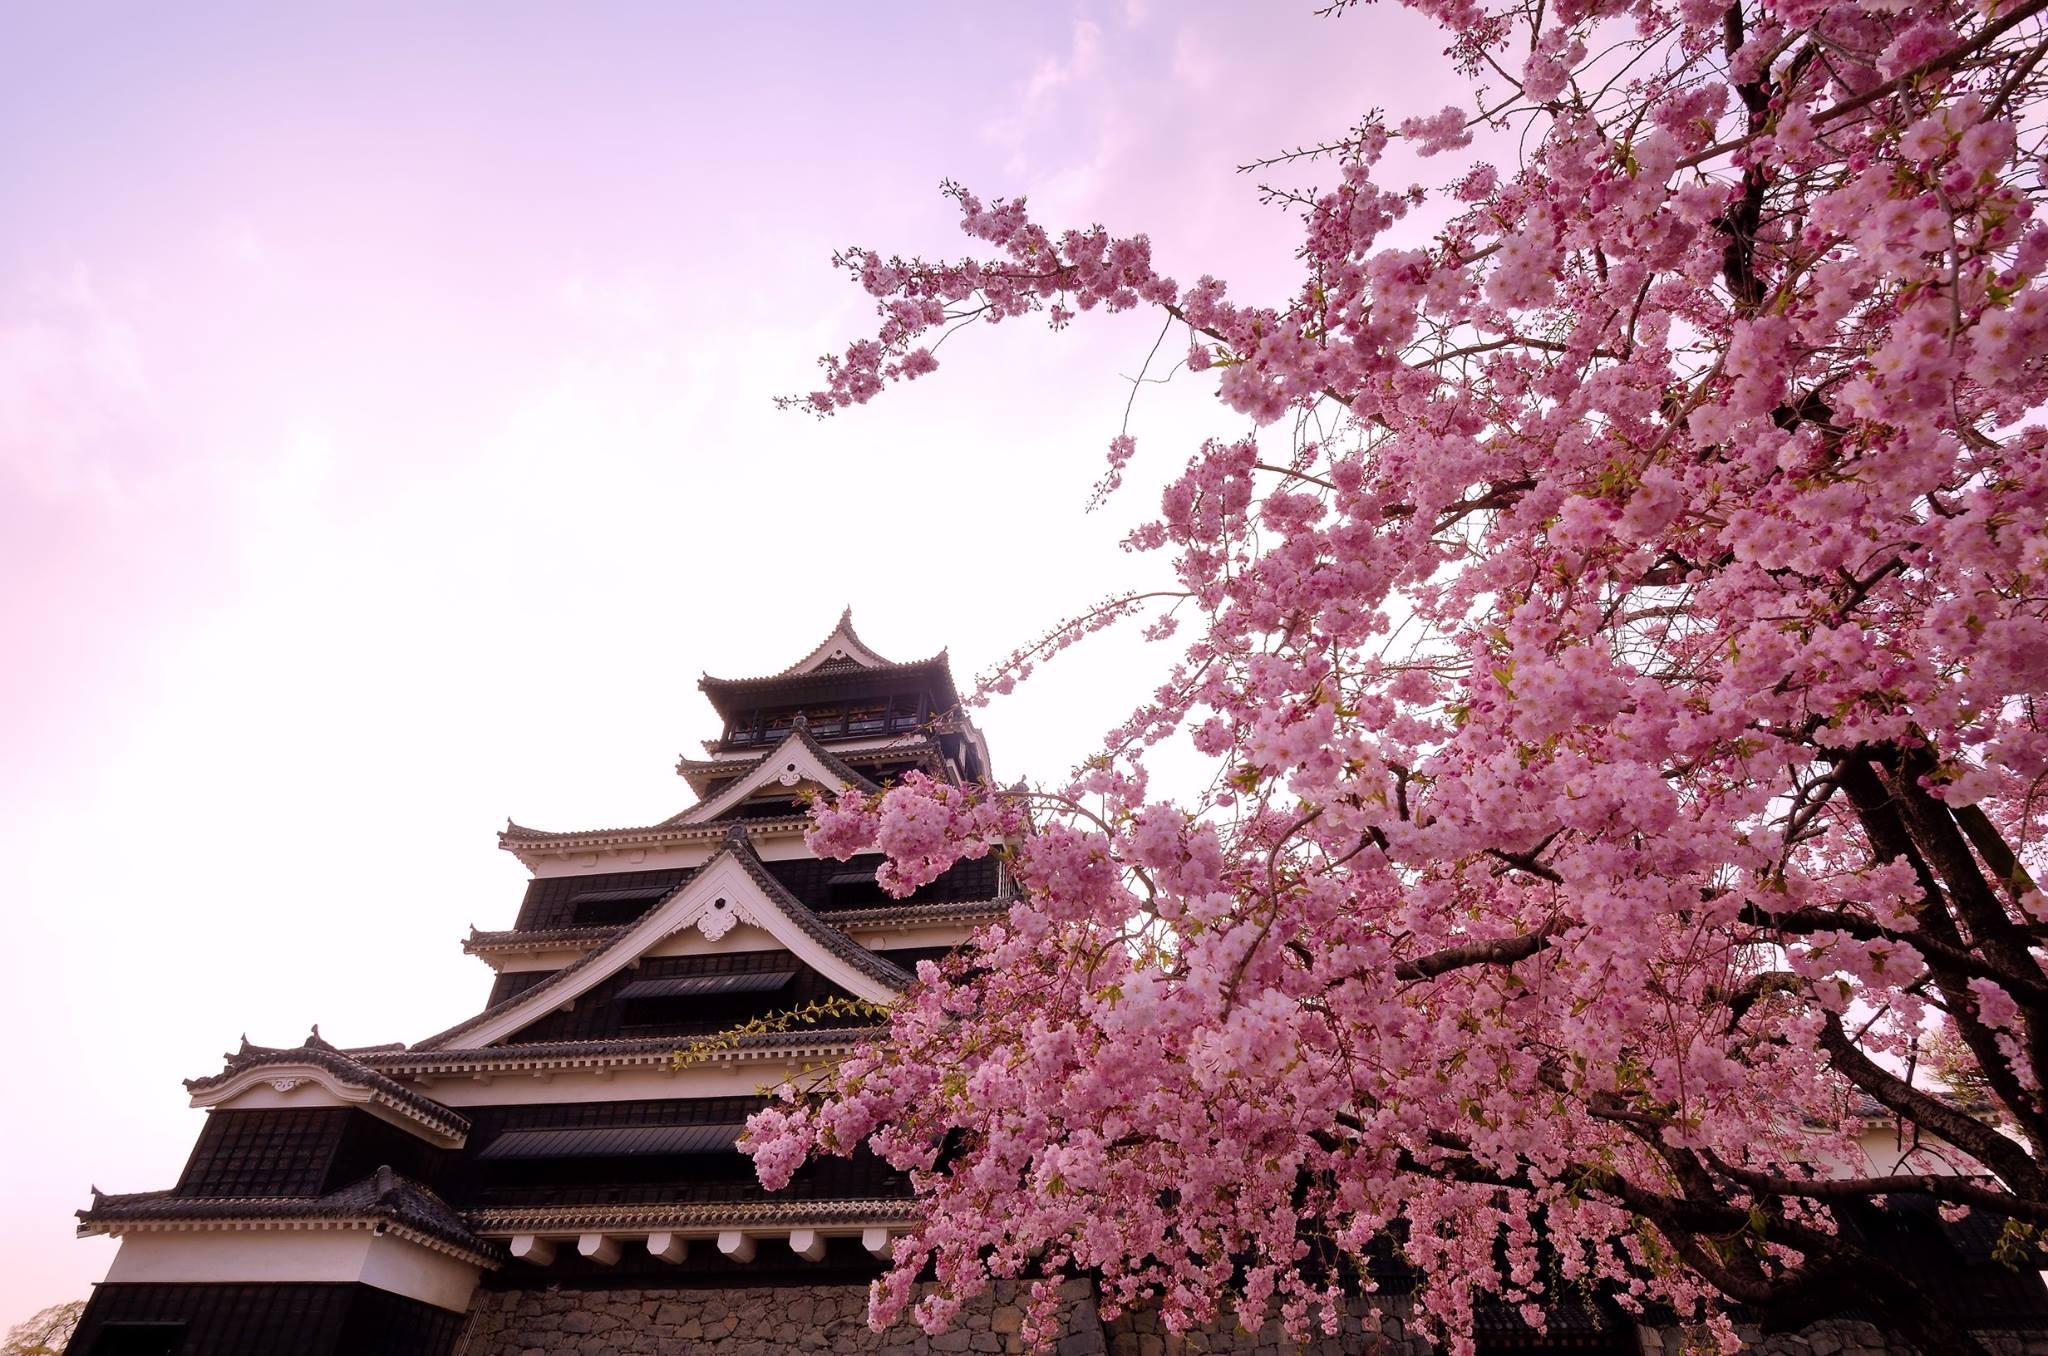 Photo: 熊本城公式Facebook ページ